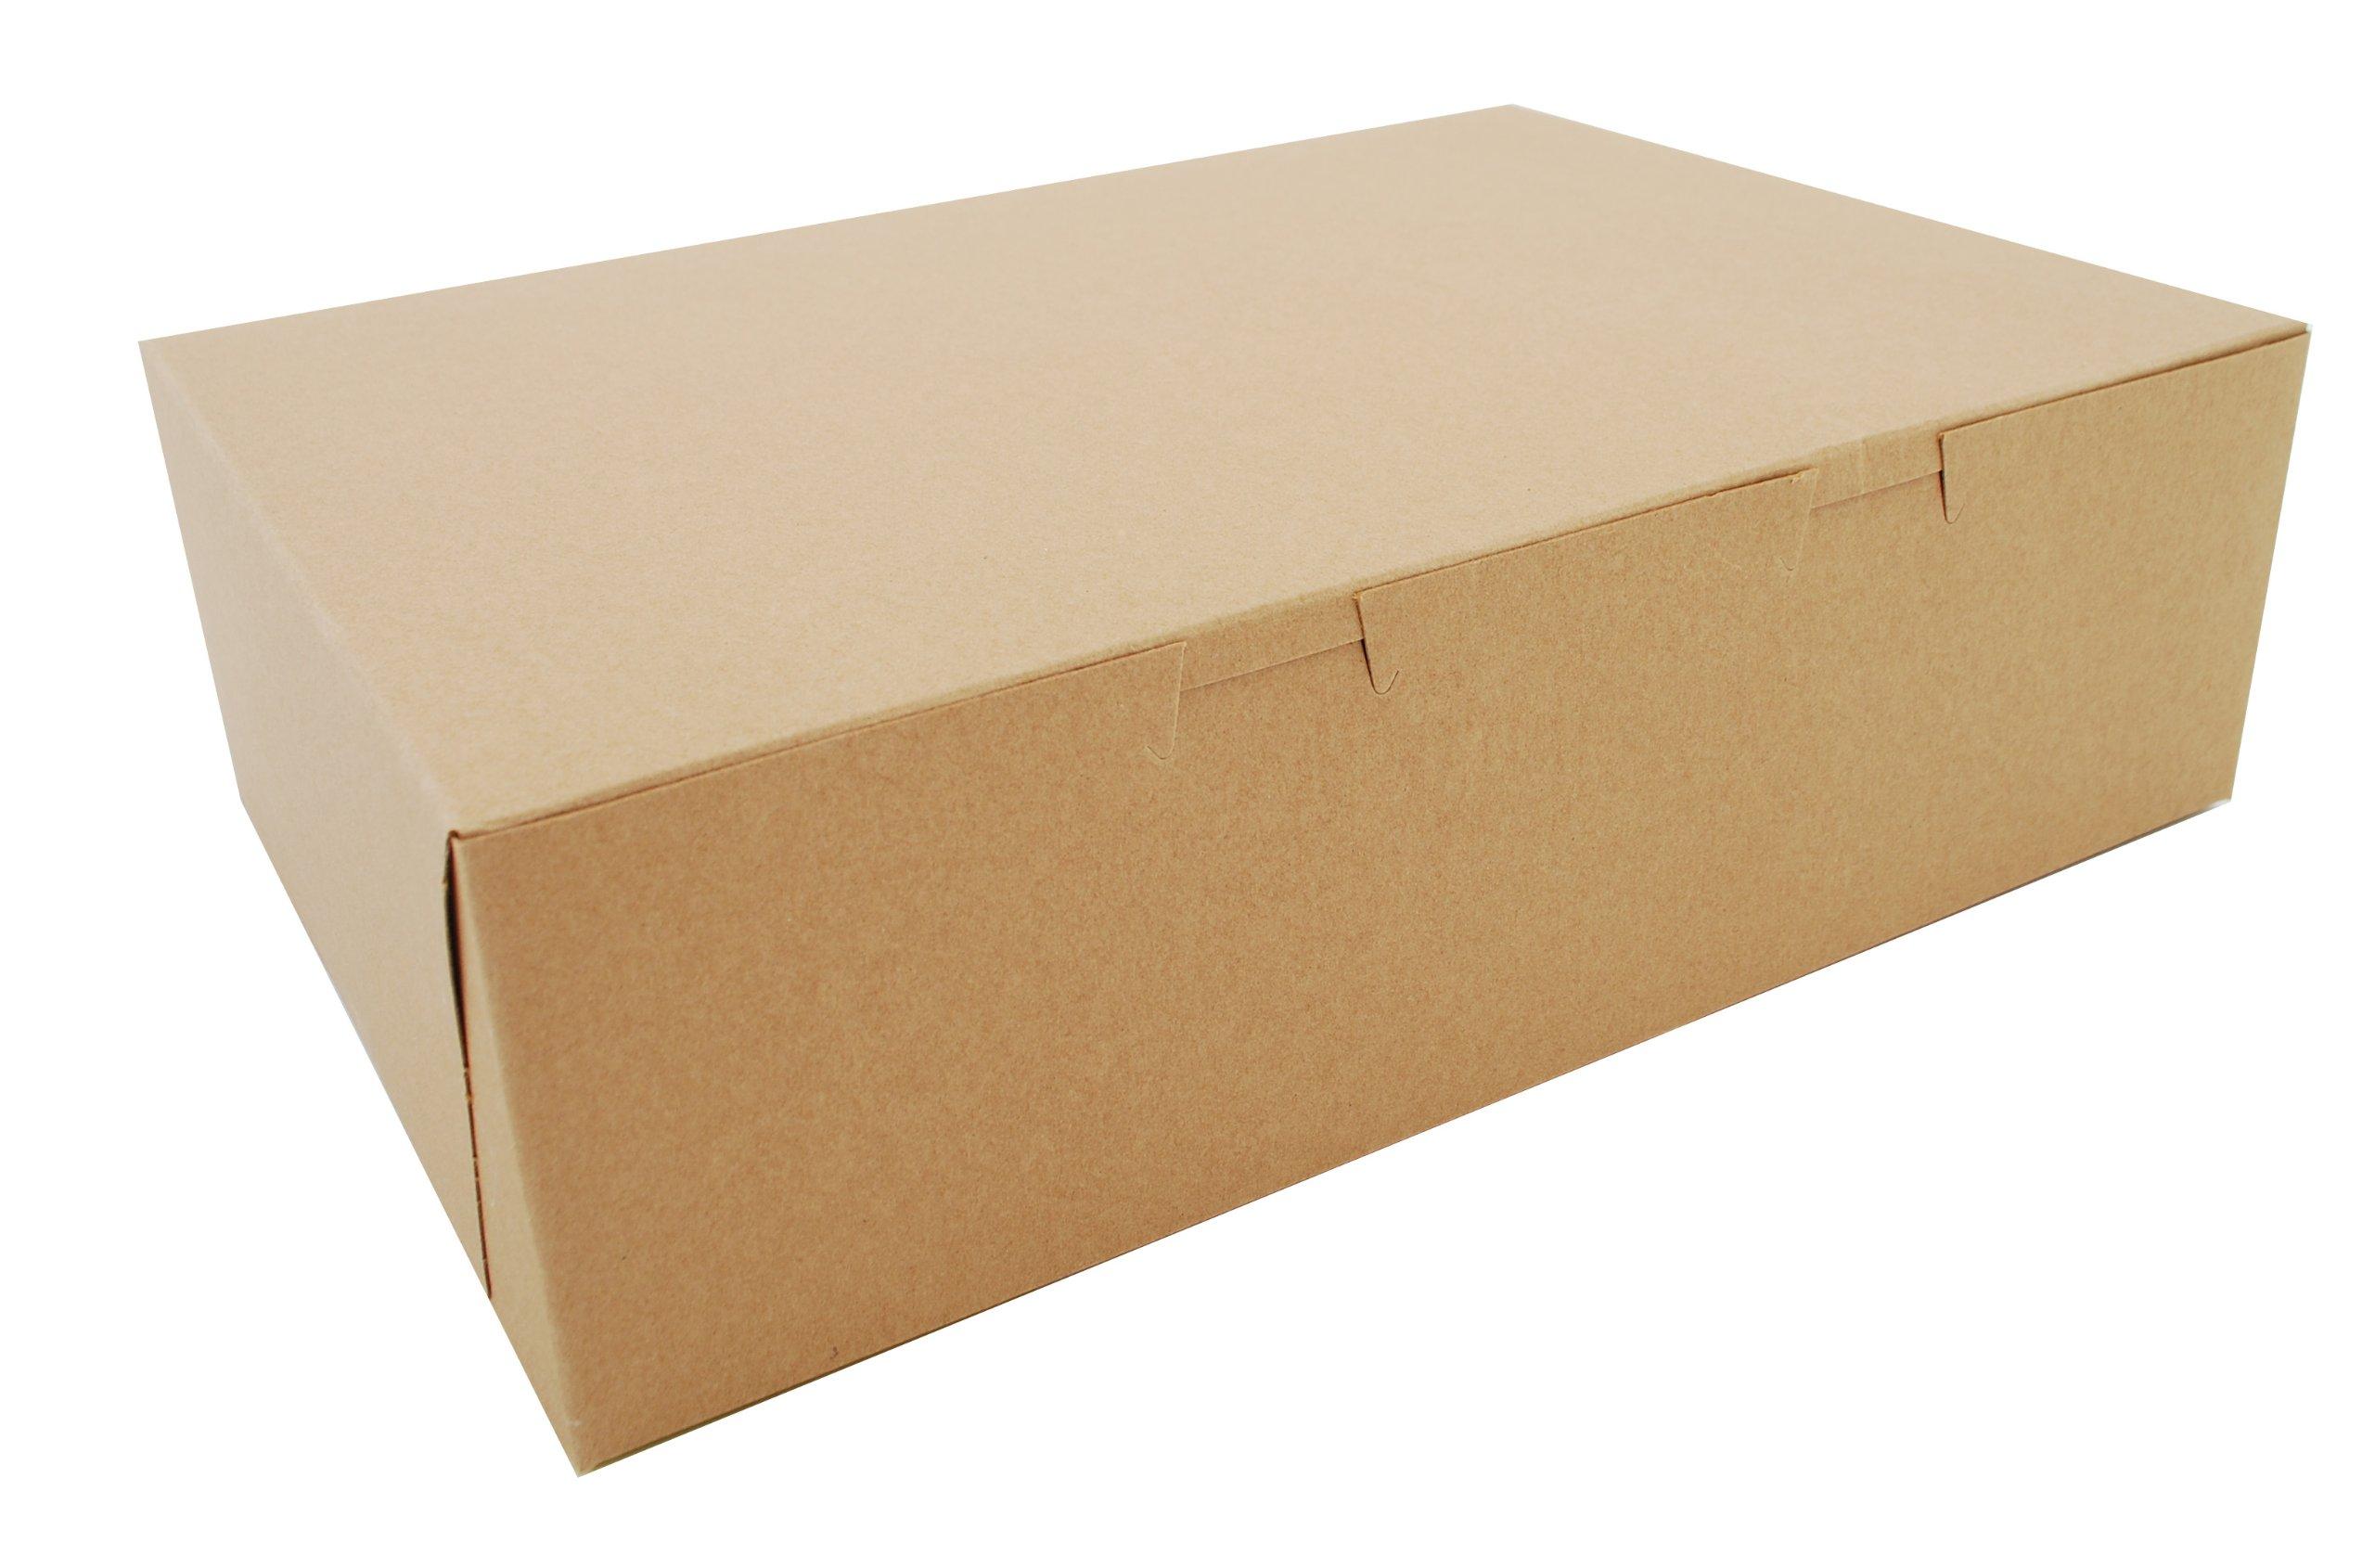 Southern Champion Tray 1025K Kraft Non Window Bakery Box, 14'' Length x 10'' Width x 4'' Height (Case of 100)